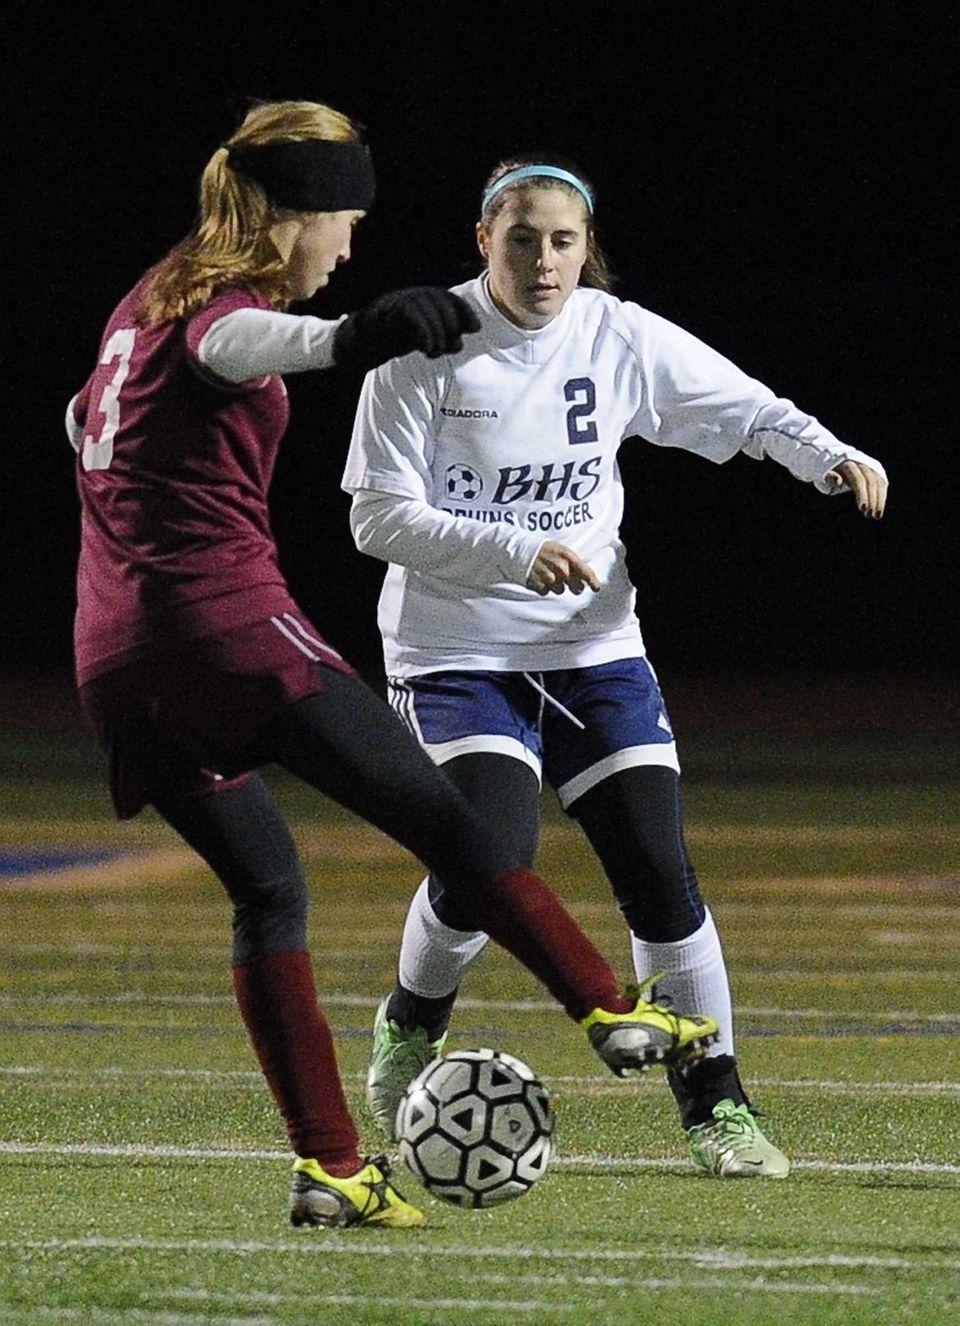 Nassau County's Alyssa Gangi defends against Suffolk County.